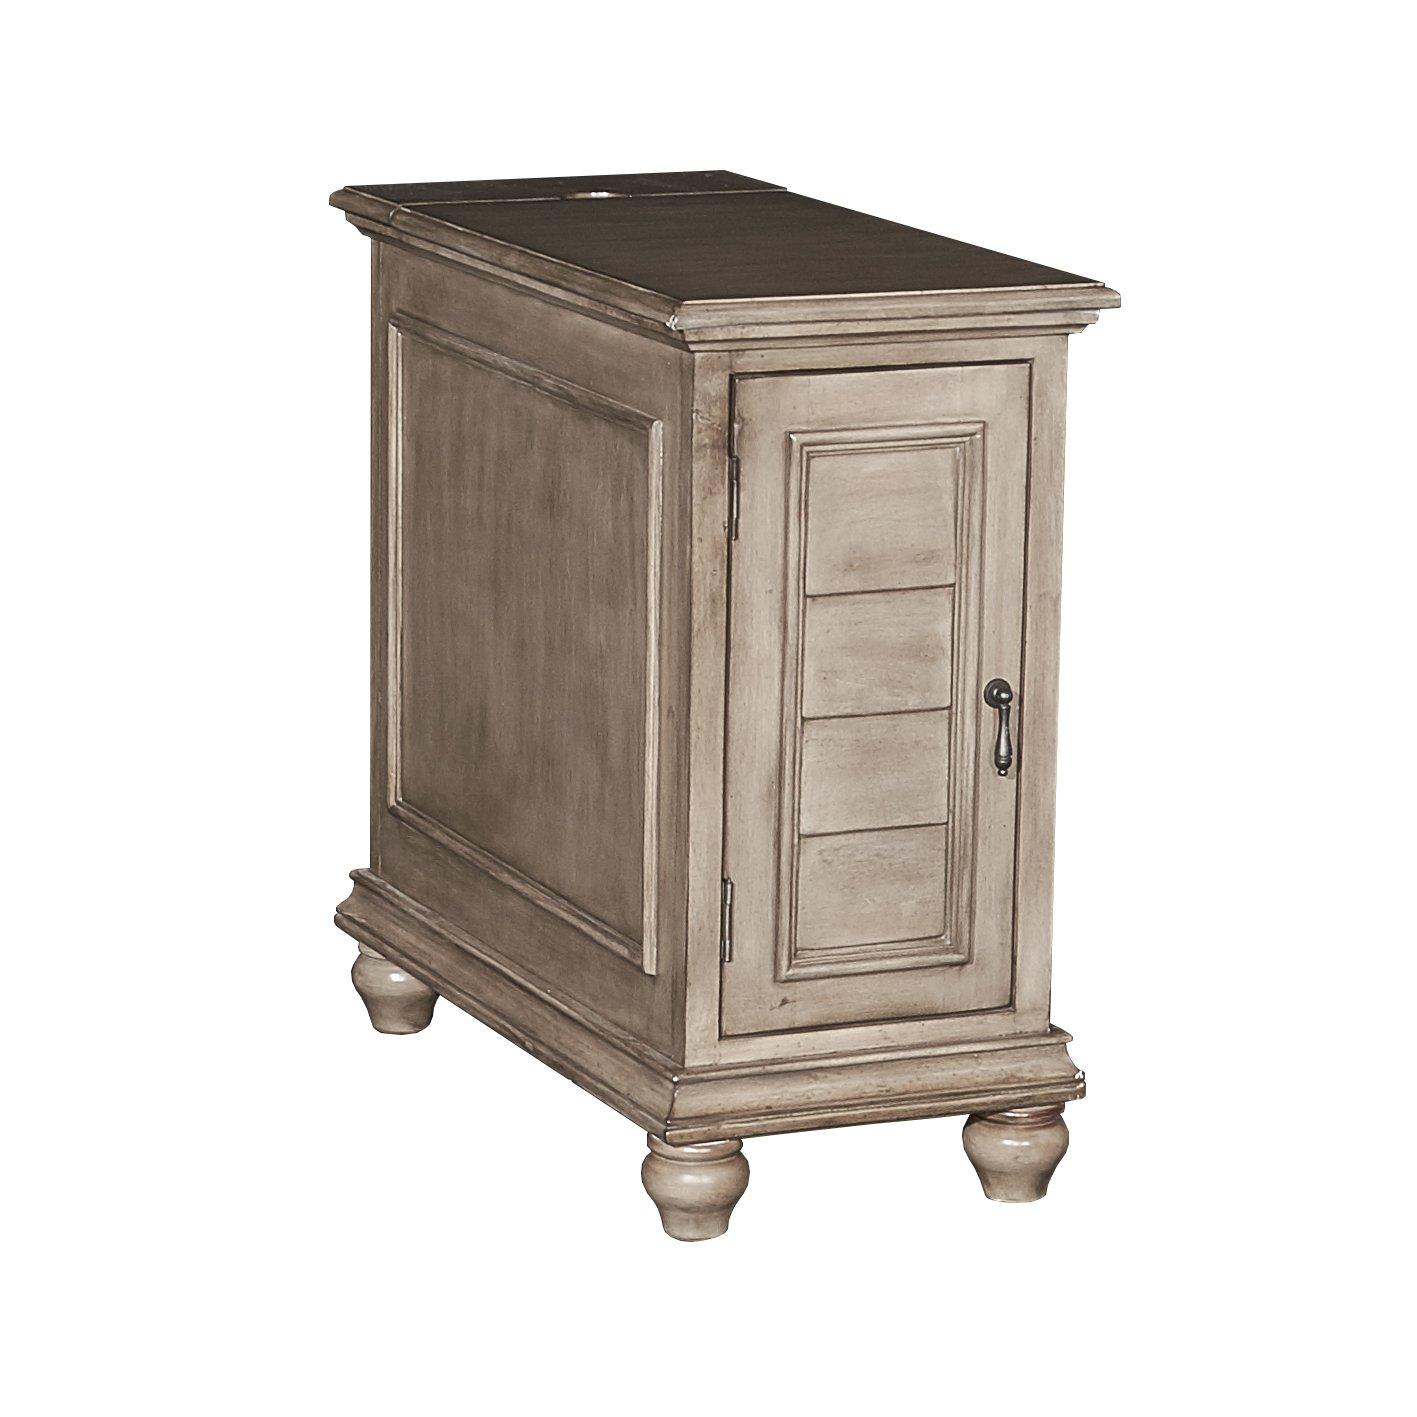 Grey Powell's Furniture 16A8257C Olsen Cream Shutter Cabinet,